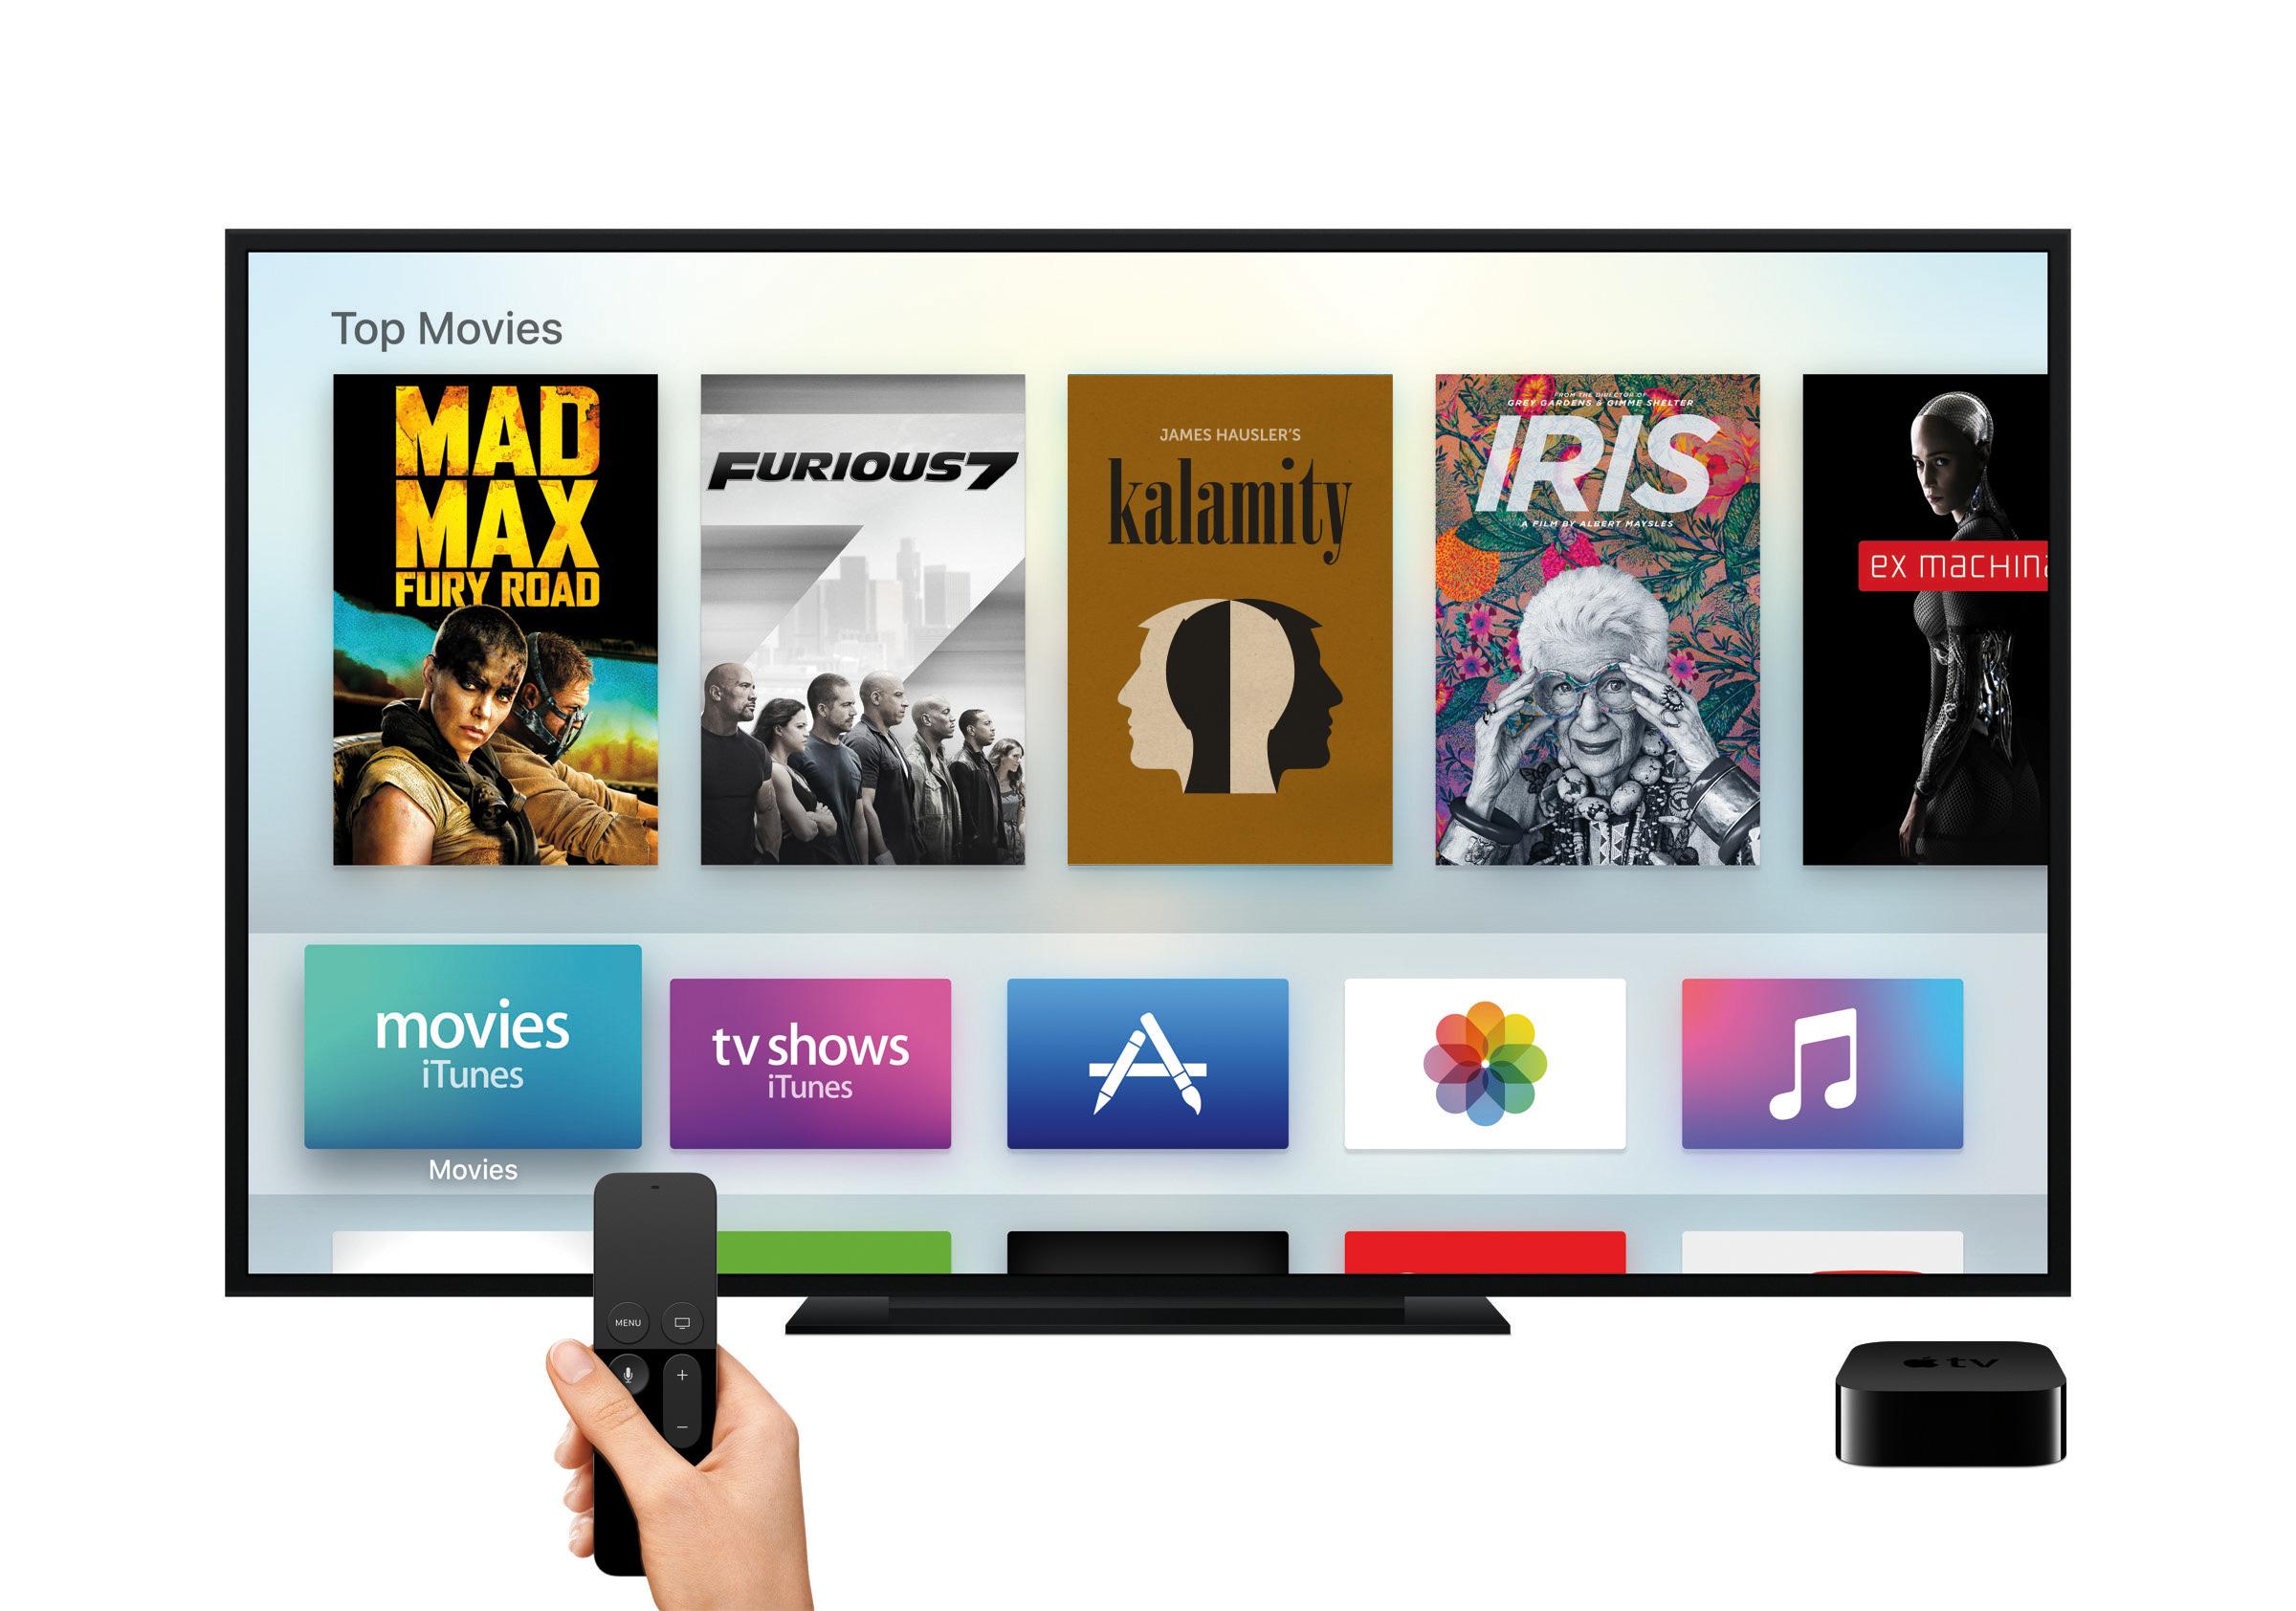 apple-tv-selection-screen04.jpg